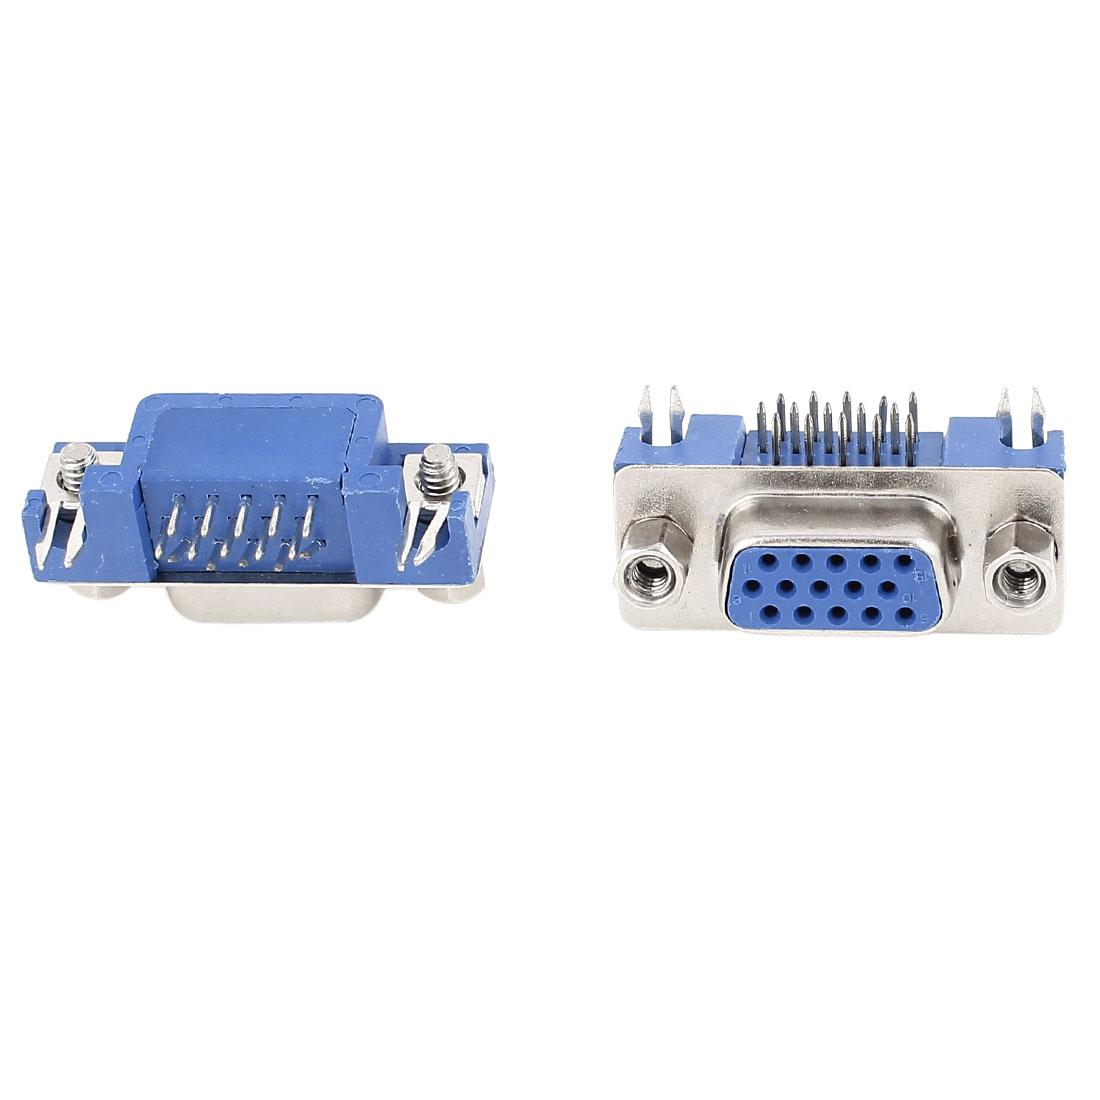 2 Pcs D-SUB 15 Pin 3 Rows Female Right Angle PCB Mounting VGA Connectors